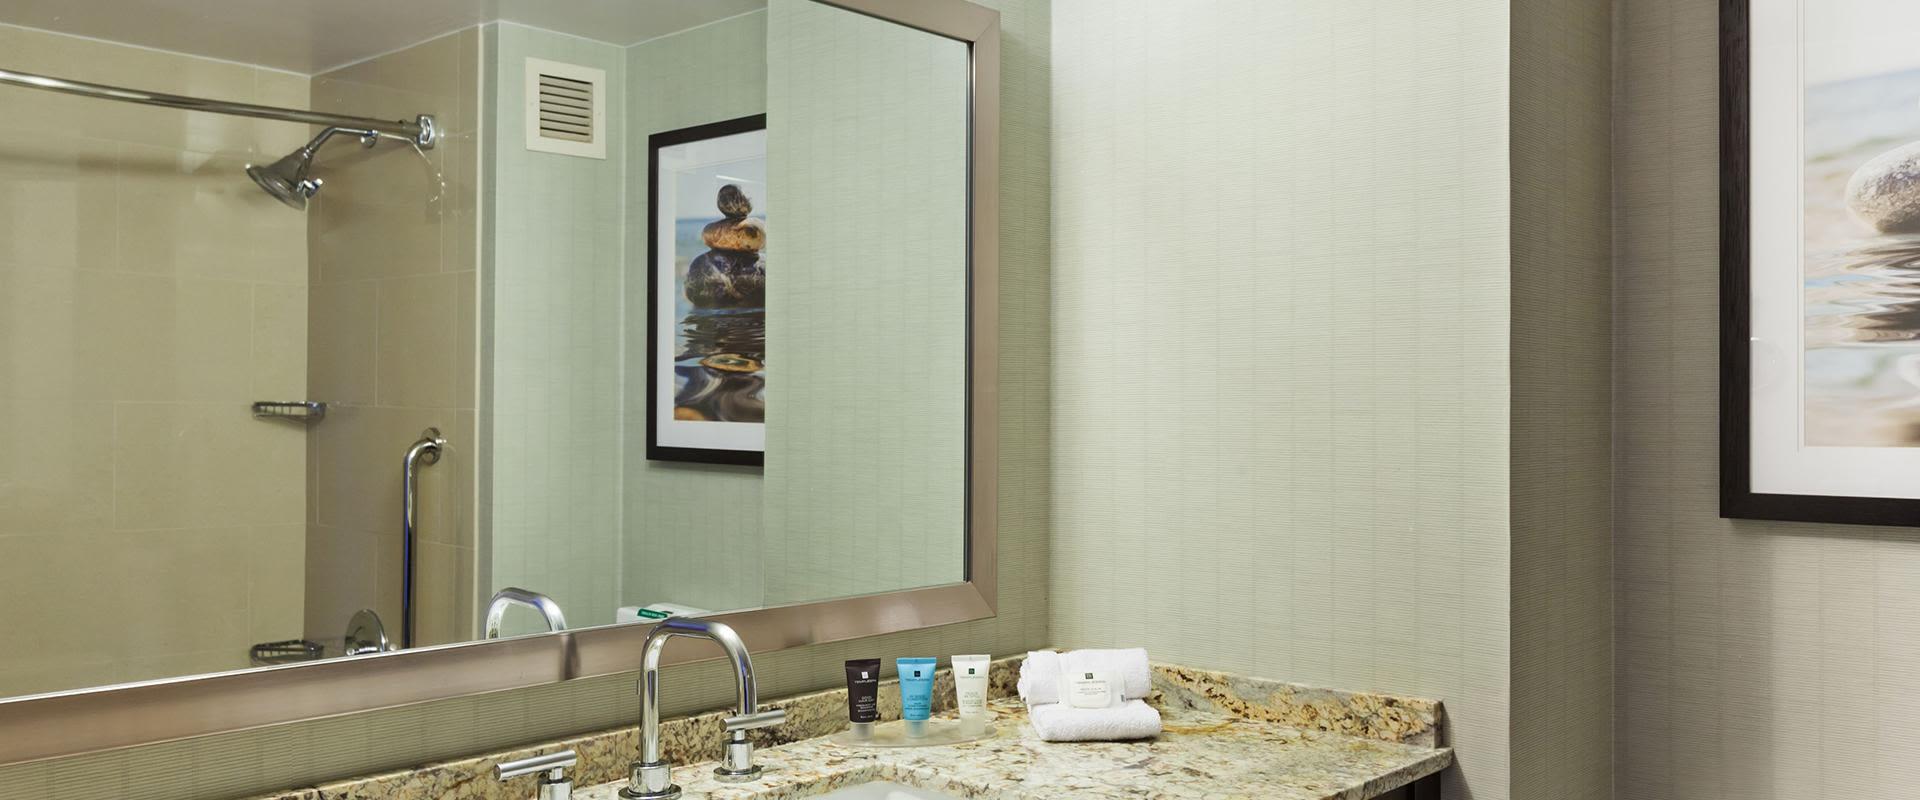 Redondo Beach Guest Room Bathroom